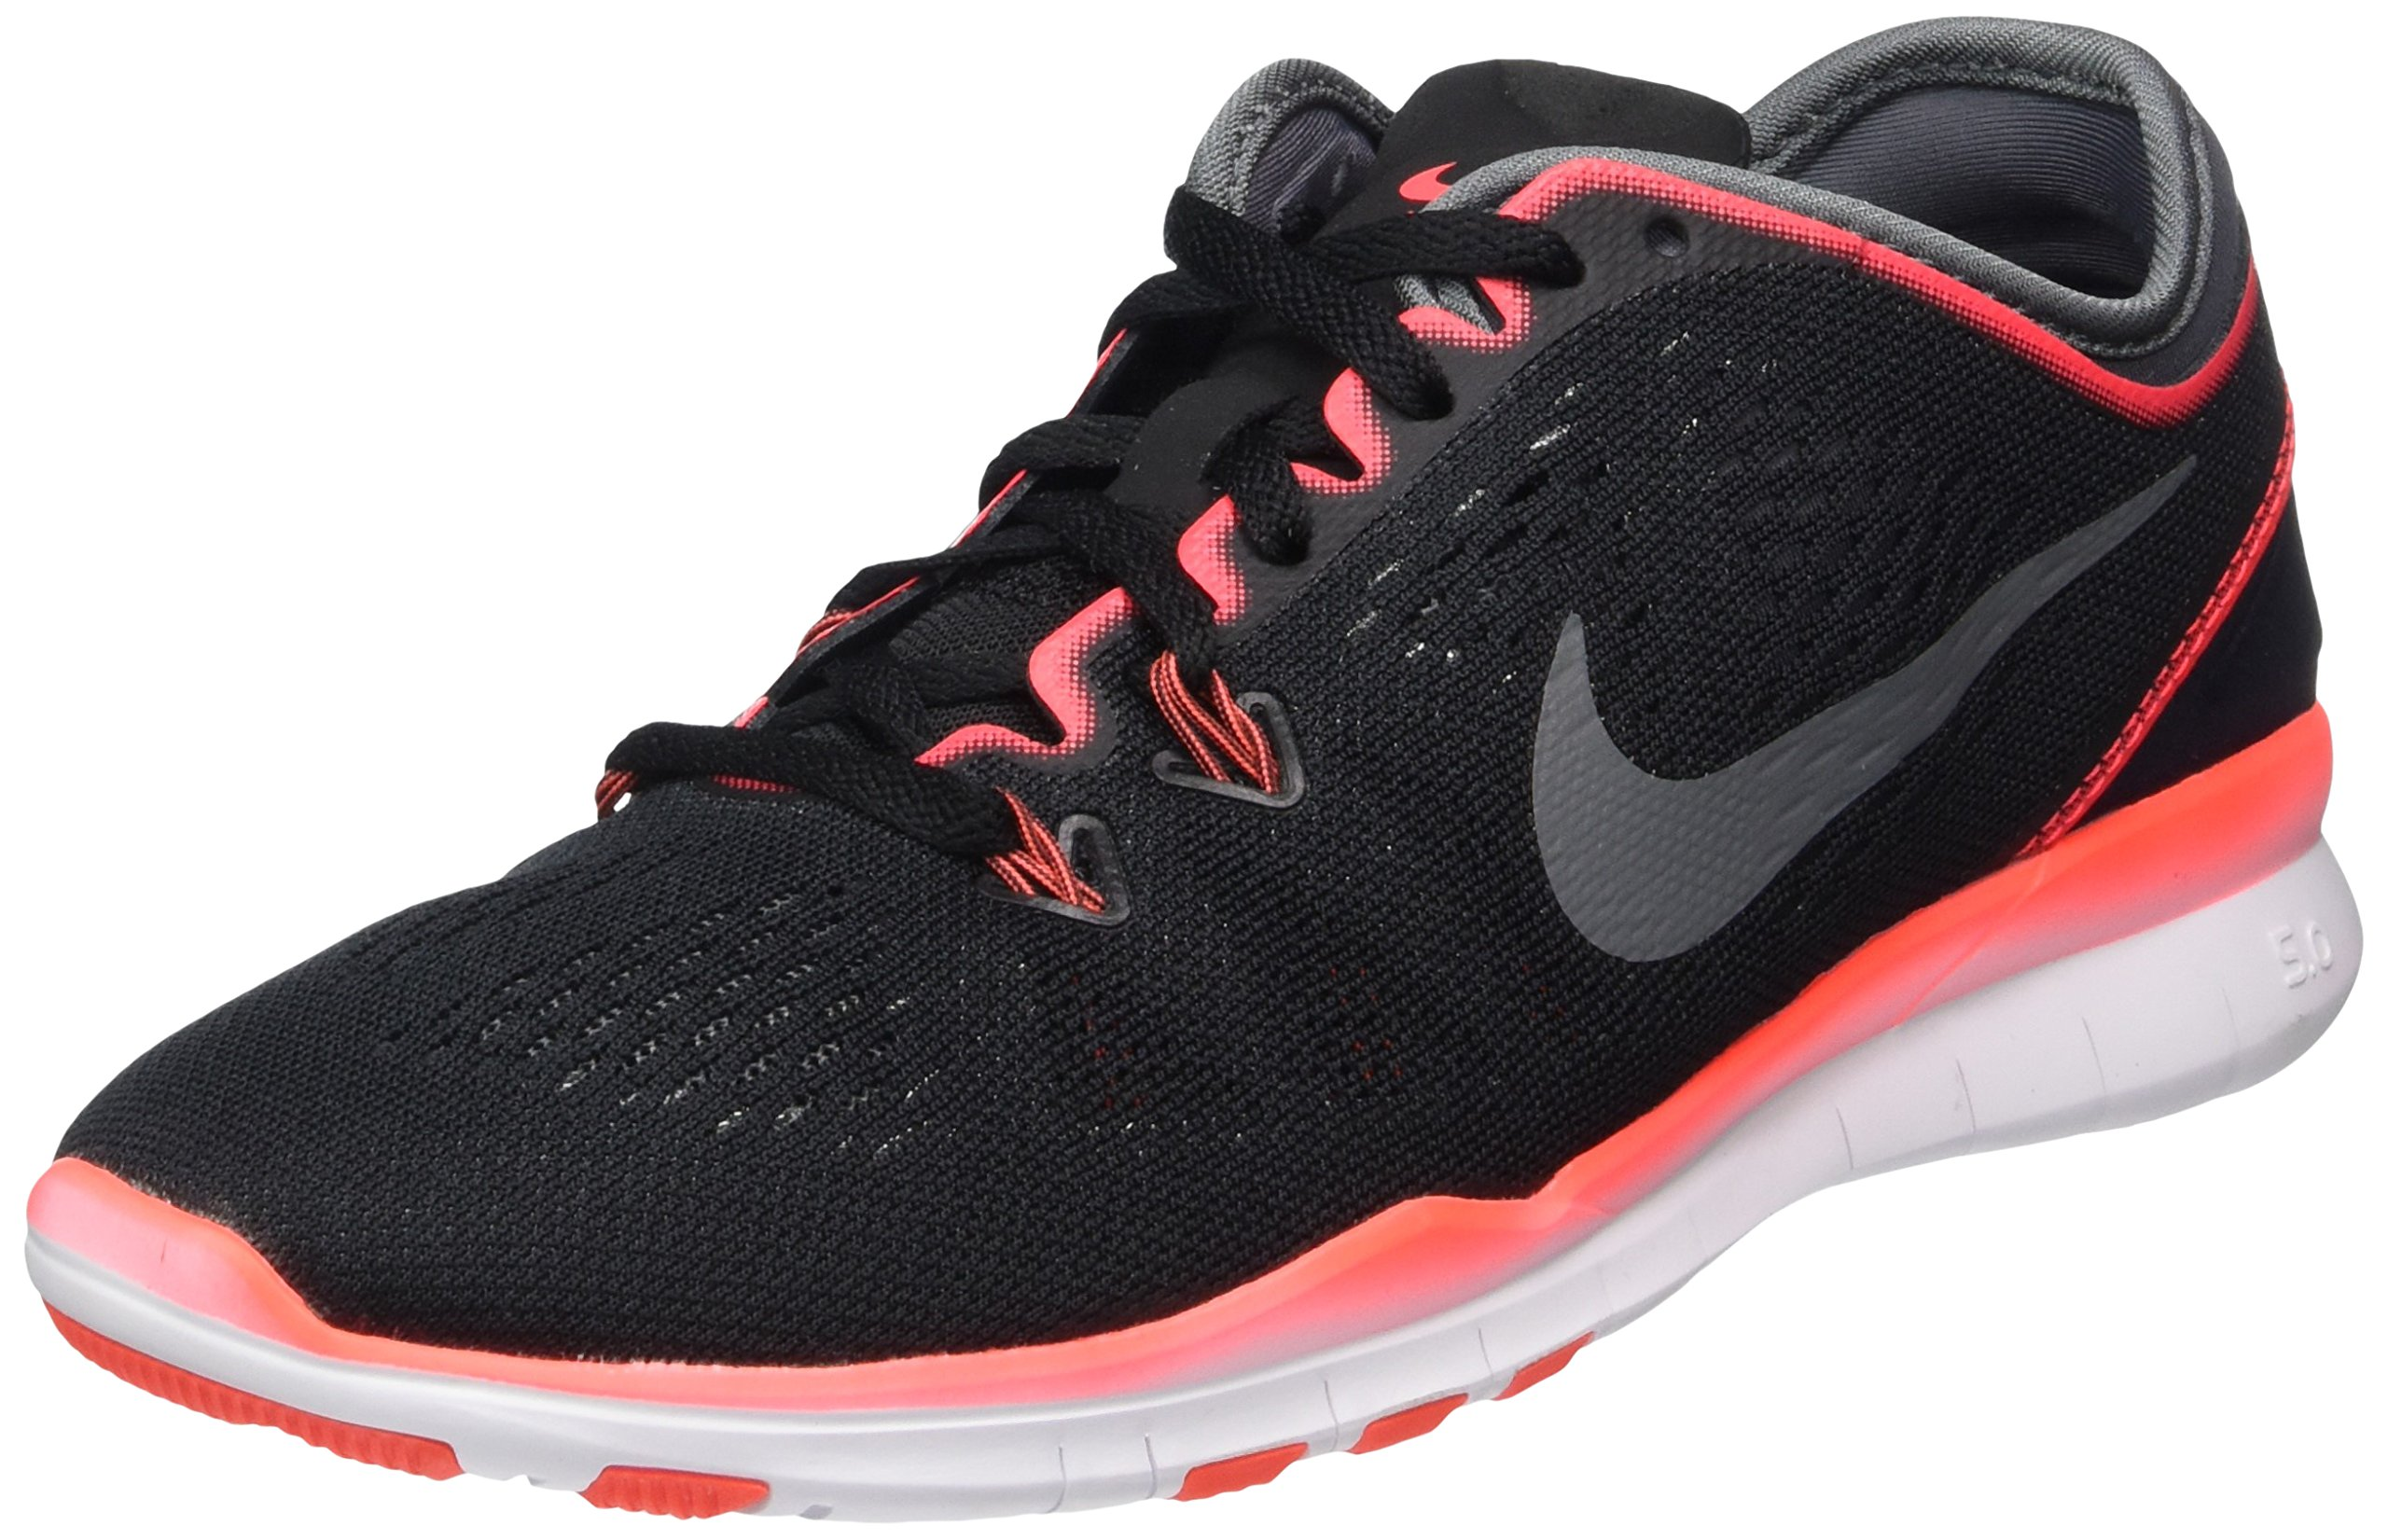 Nike Women's Free 5.0 TR Fit 5 Training Shoe Black/Bright Crimson/White/Grey Size 7 M US